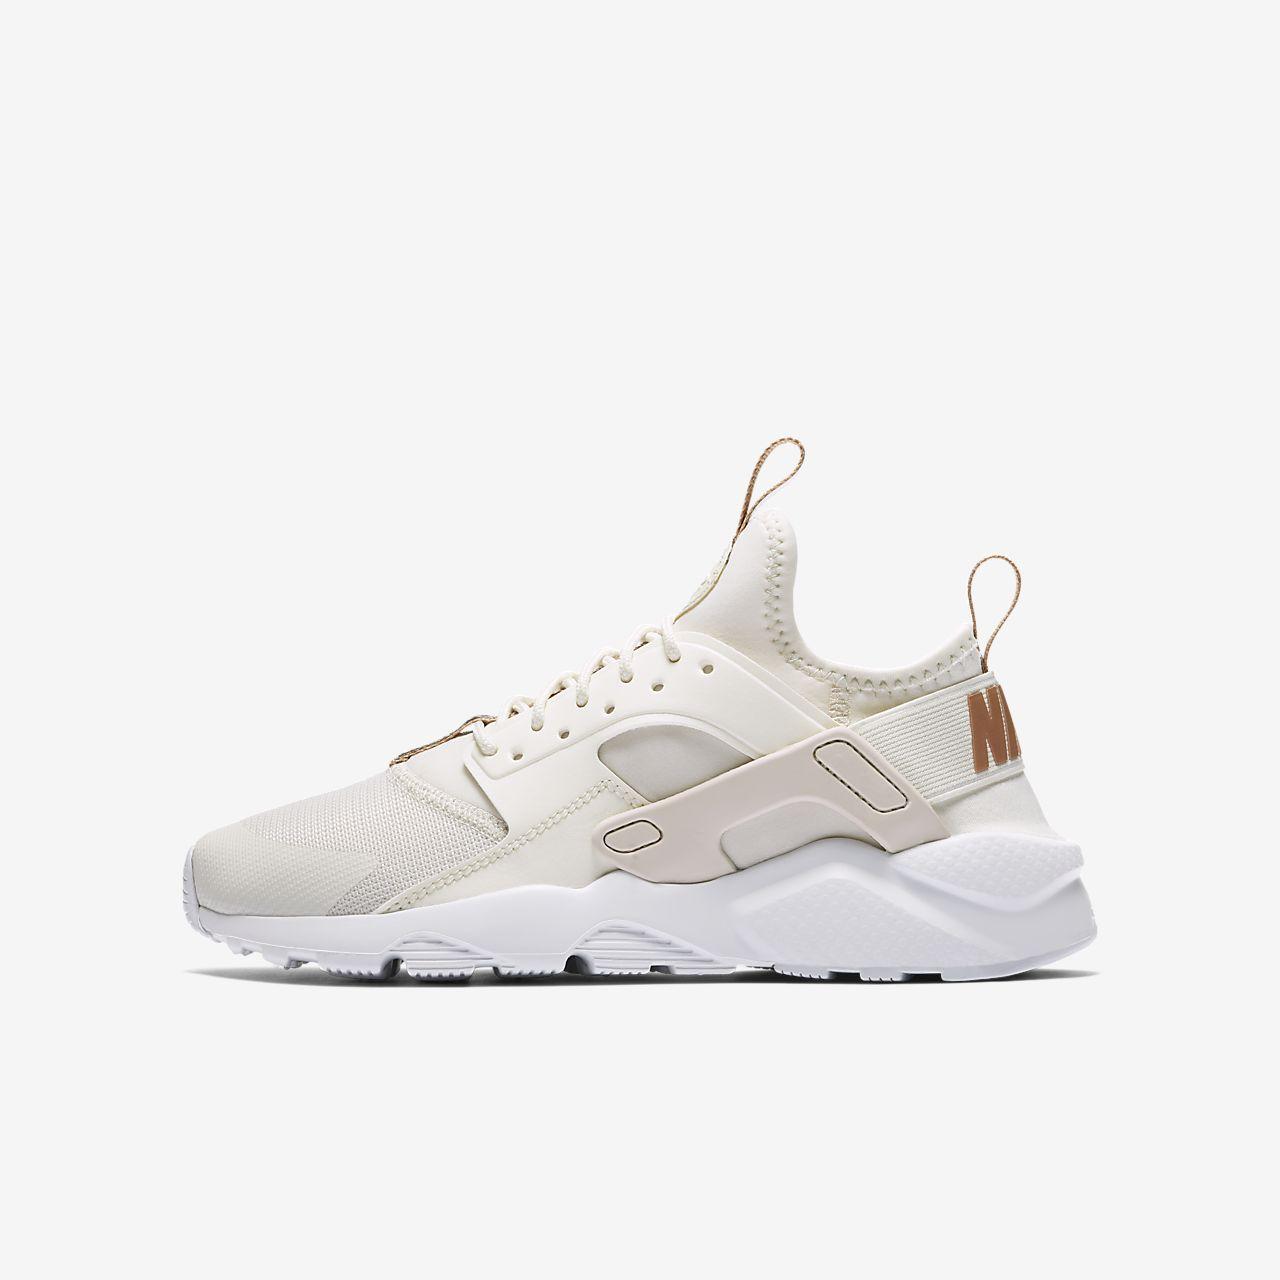 quality design b3ad4 9cbdc ... Nike Air Huarache Ultra sko for store barn